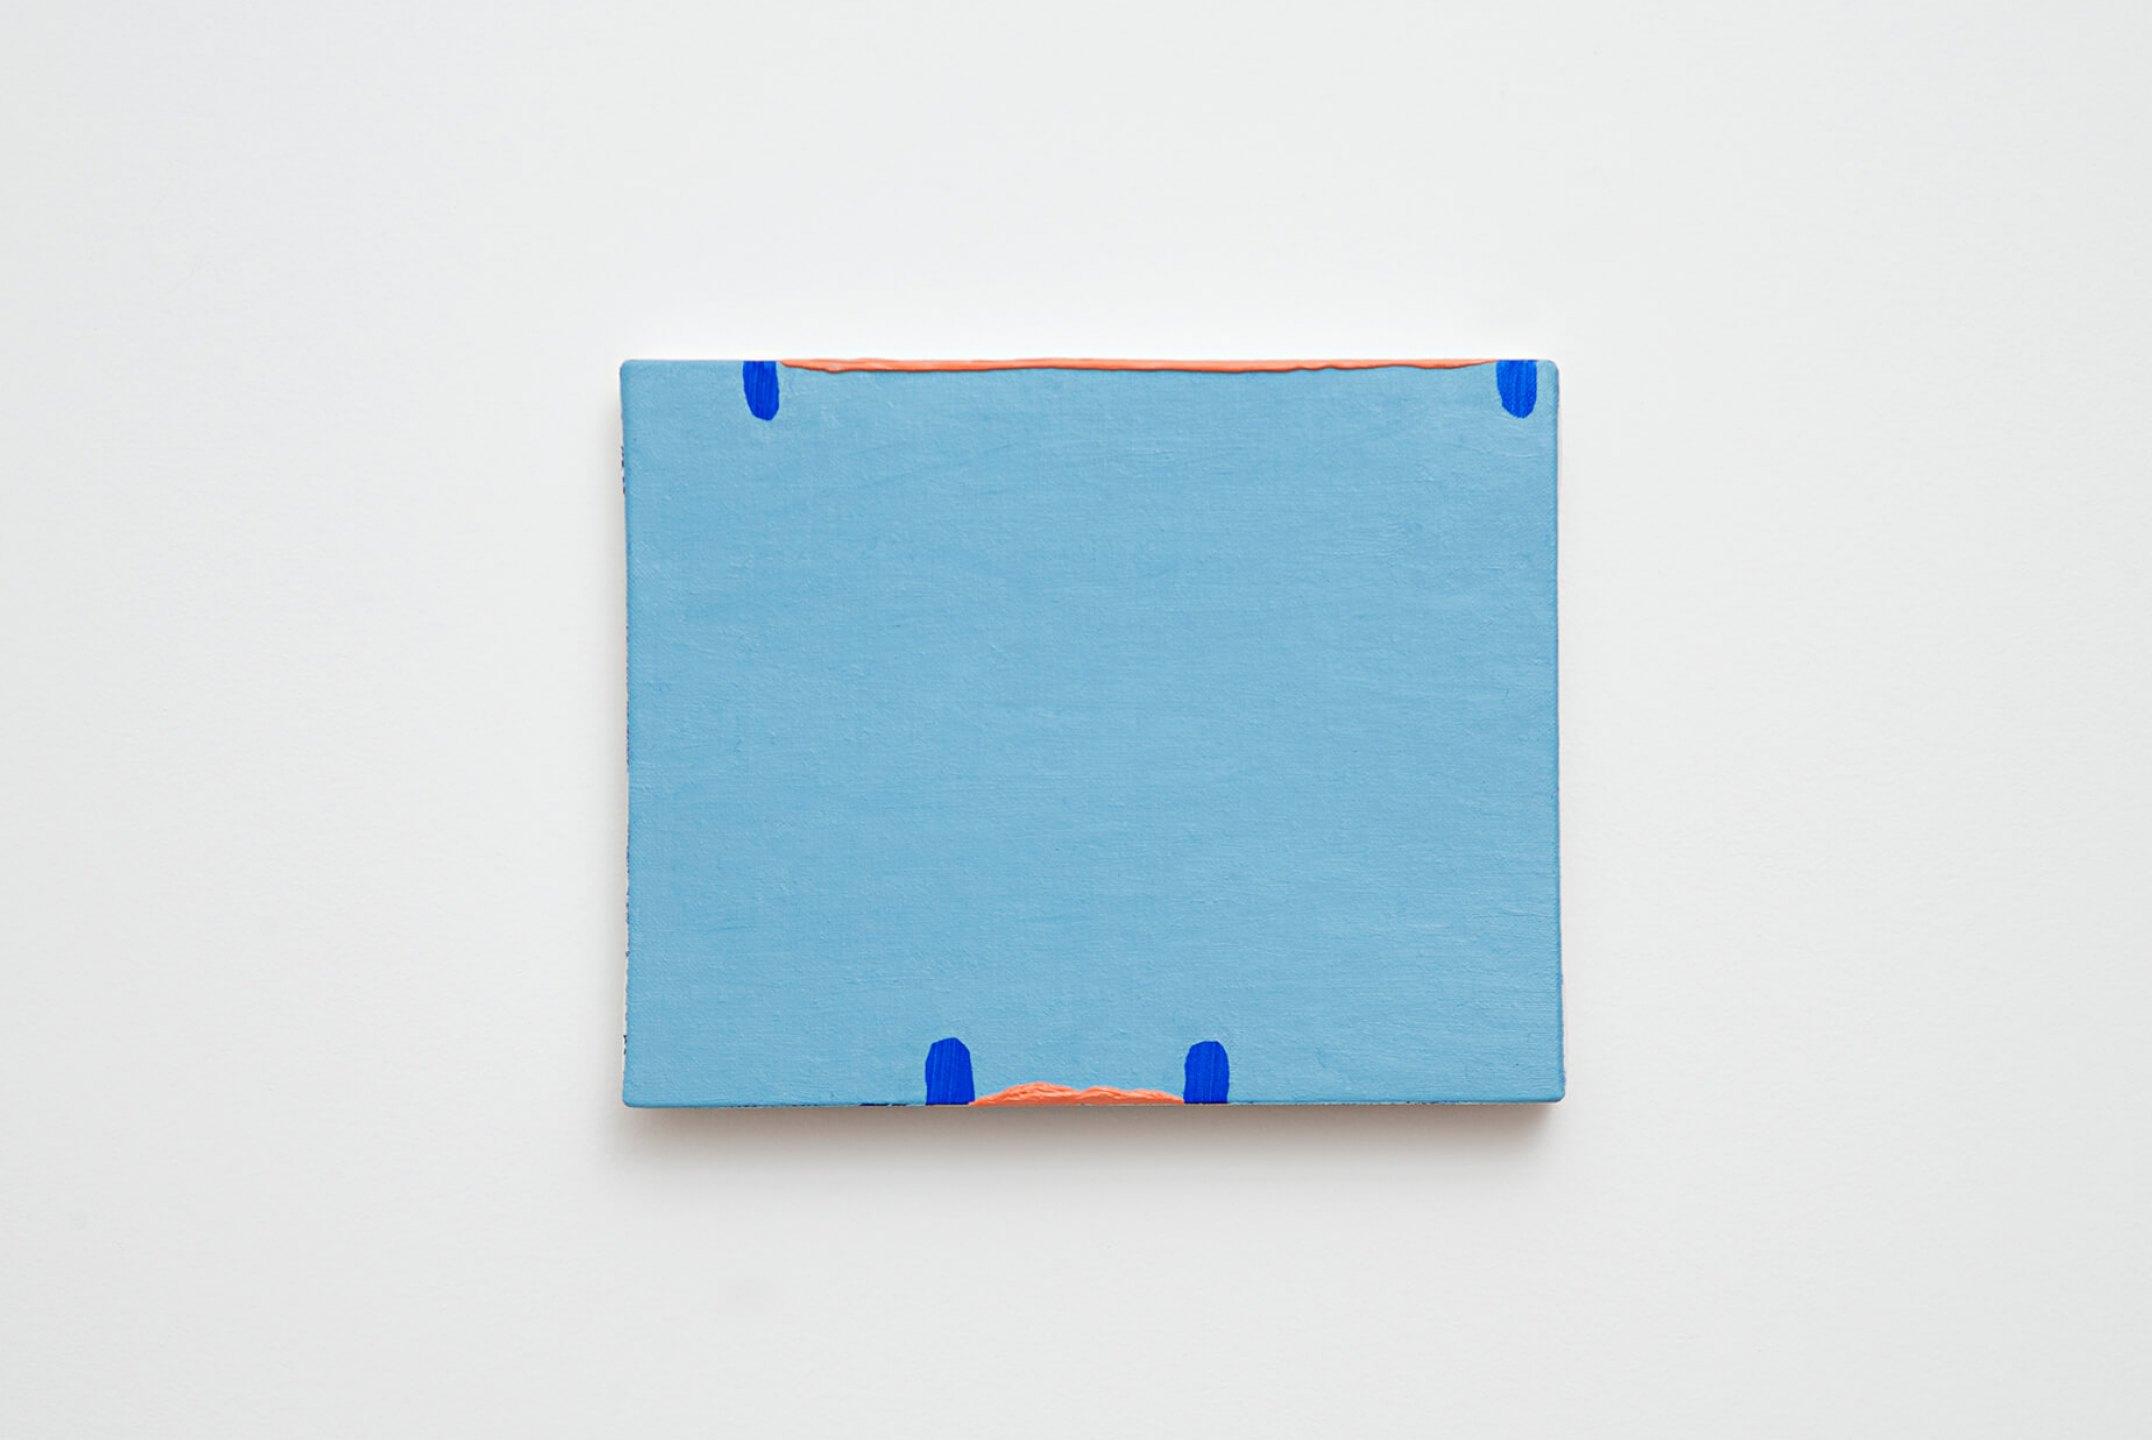 Paulo Monteiro,&nbsp;<em>untitled</em>, 2013, oil on canvas, 20,5&nbsp;×&nbsp;25 cm - Mendes Wood DM